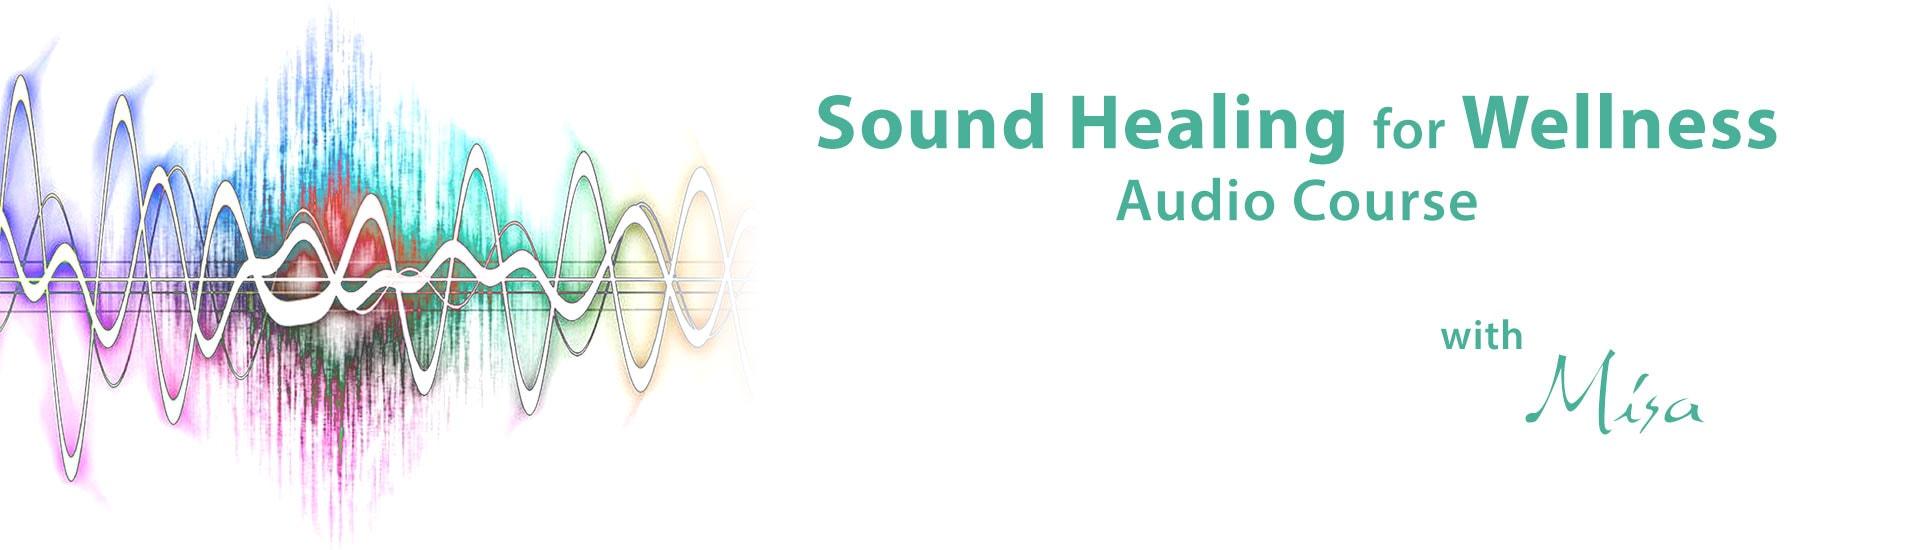 Sound-Healing-course-banner-v1@1920x550